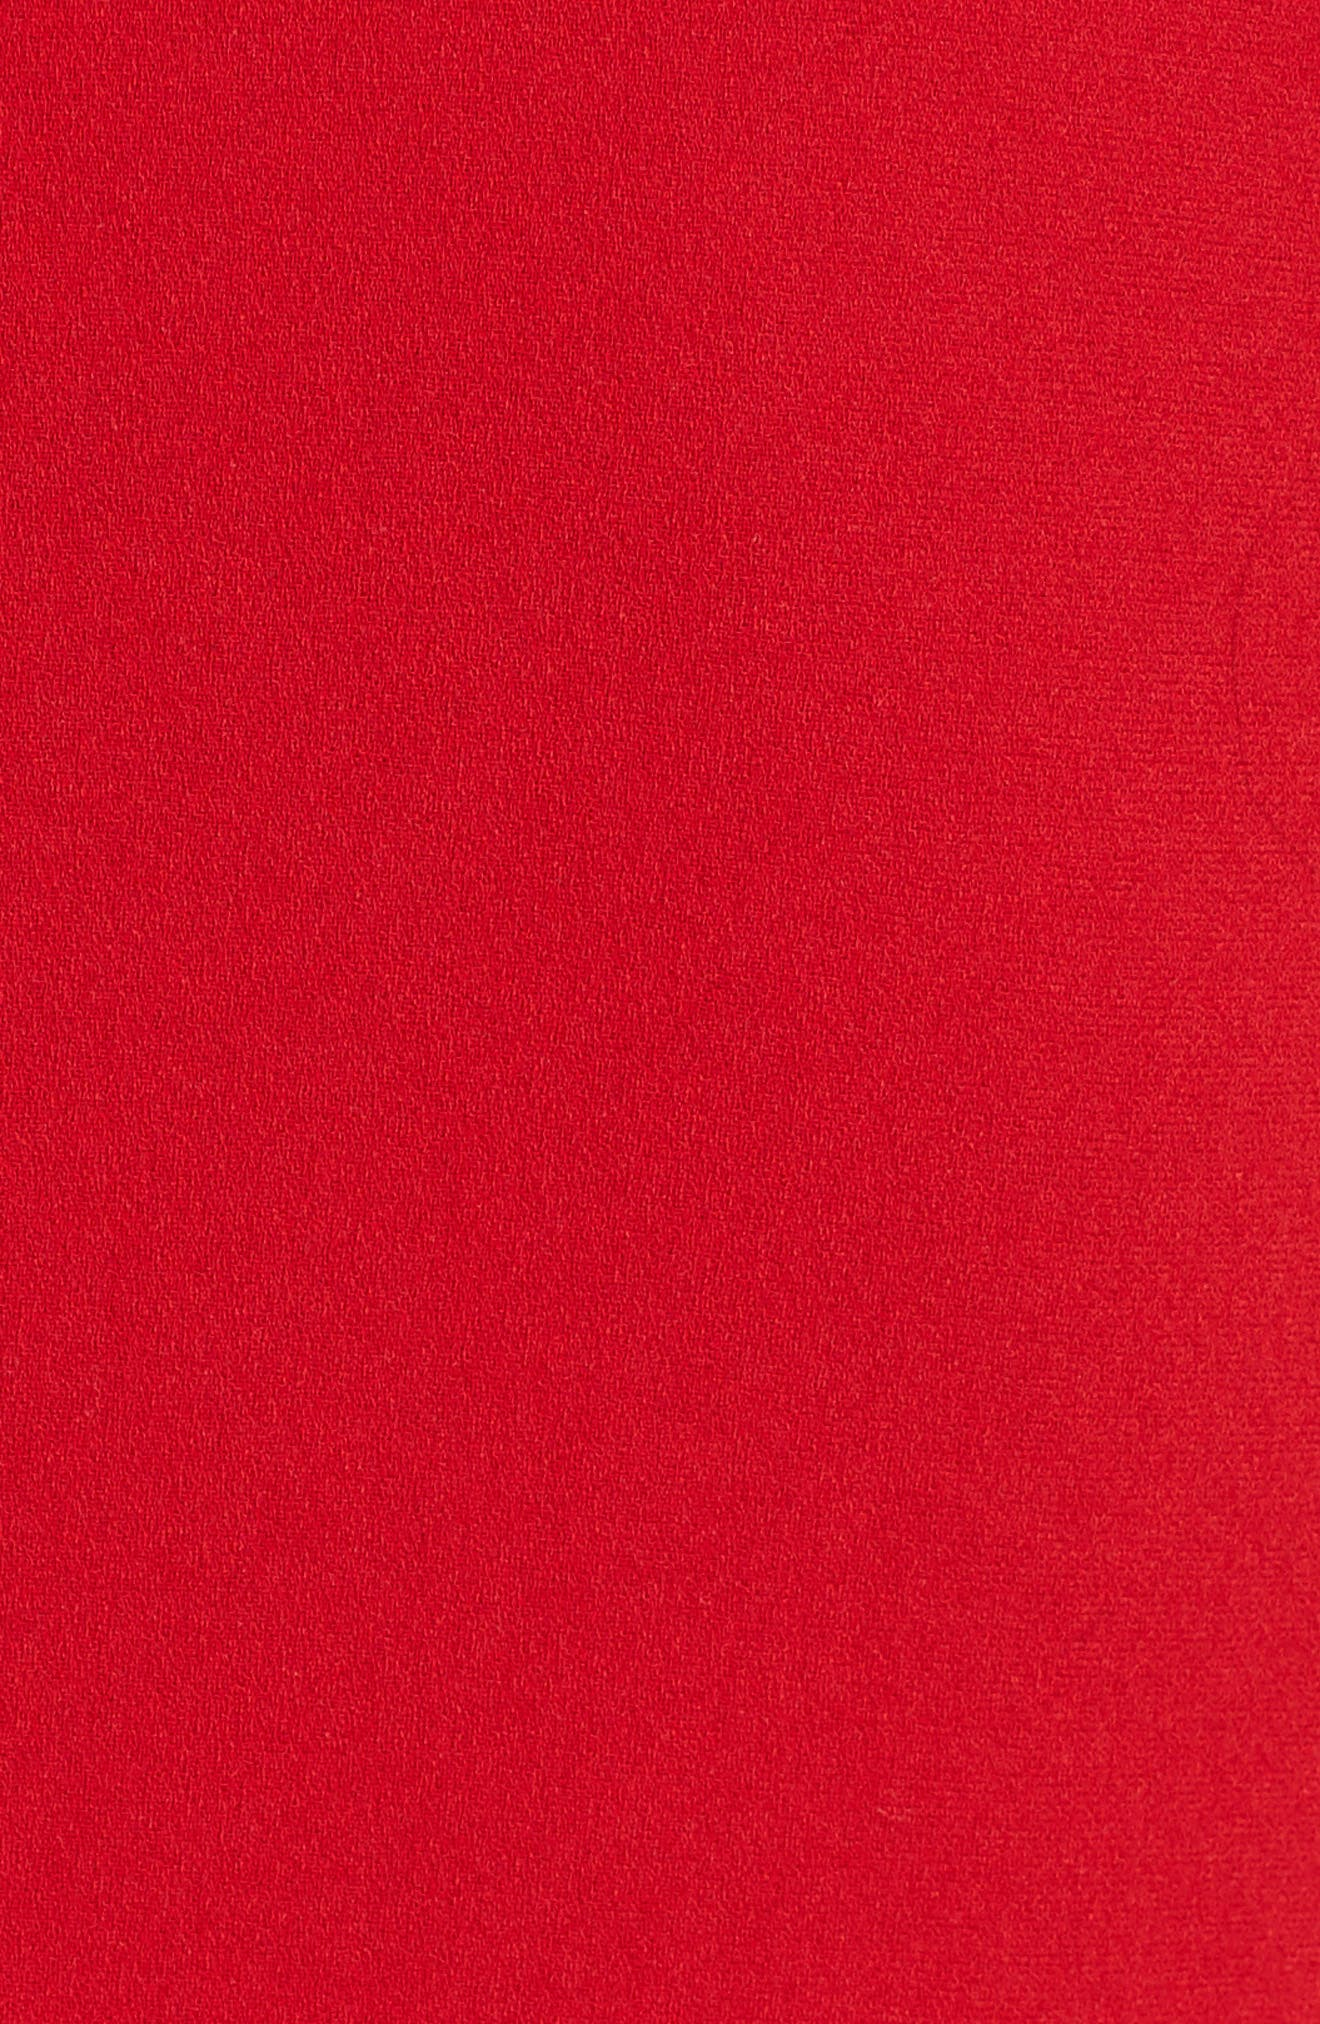 Alternate Image 3  - Victoria Beckham Crepe Minidress